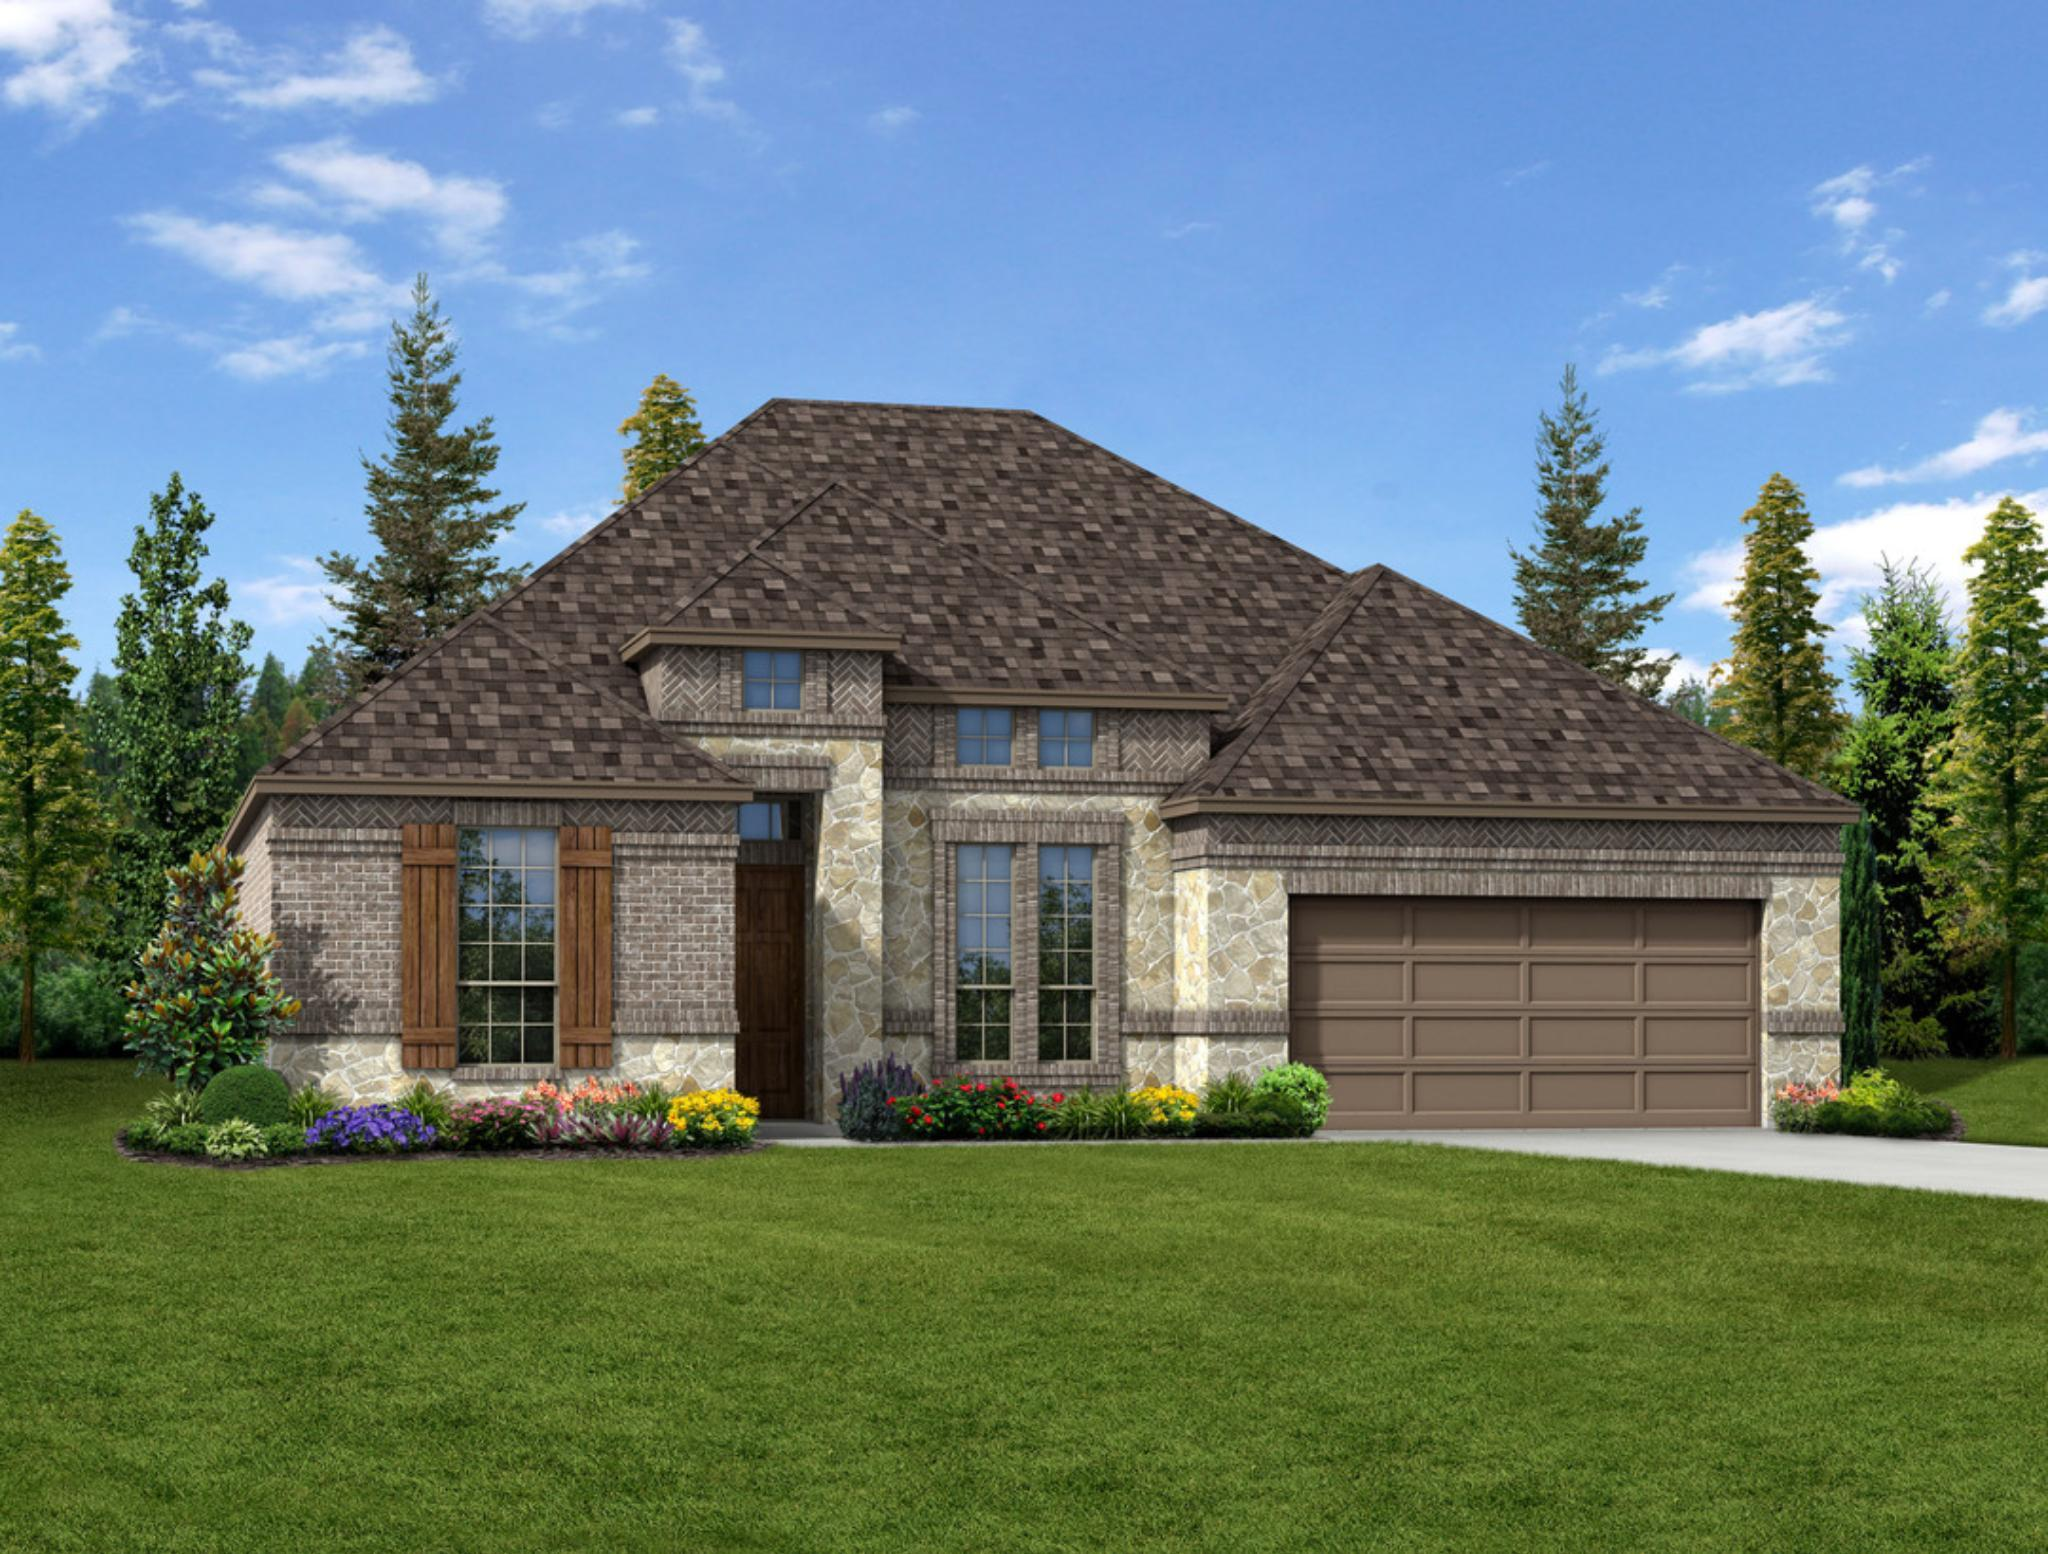 New Homes For Sale In 75087 Dallas